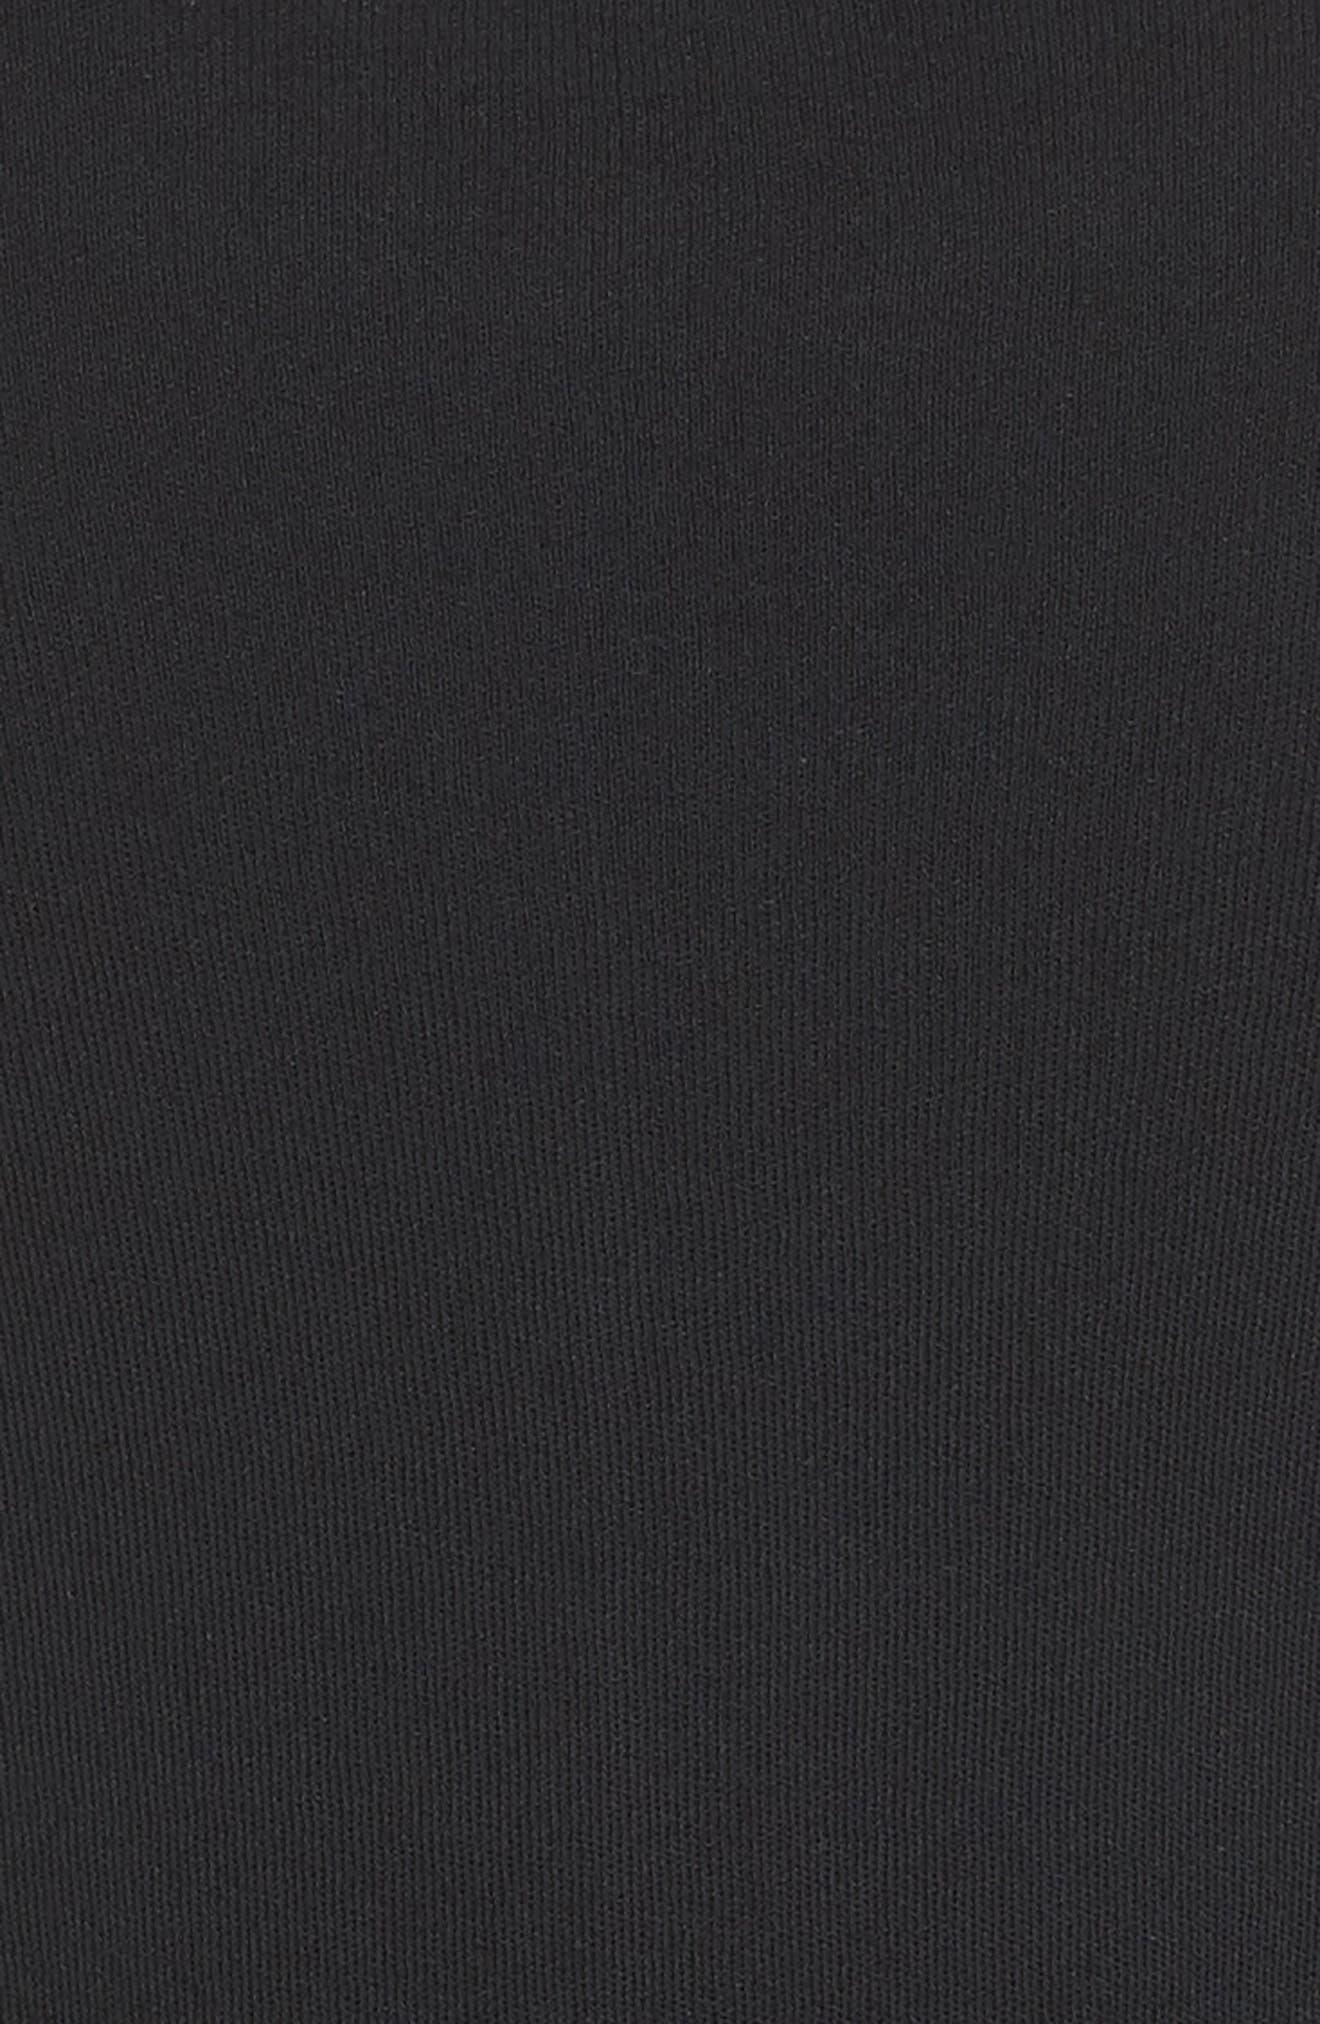 Bell Sleeve Cardigan,                             Alternate thumbnail 5, color,                             BLACK